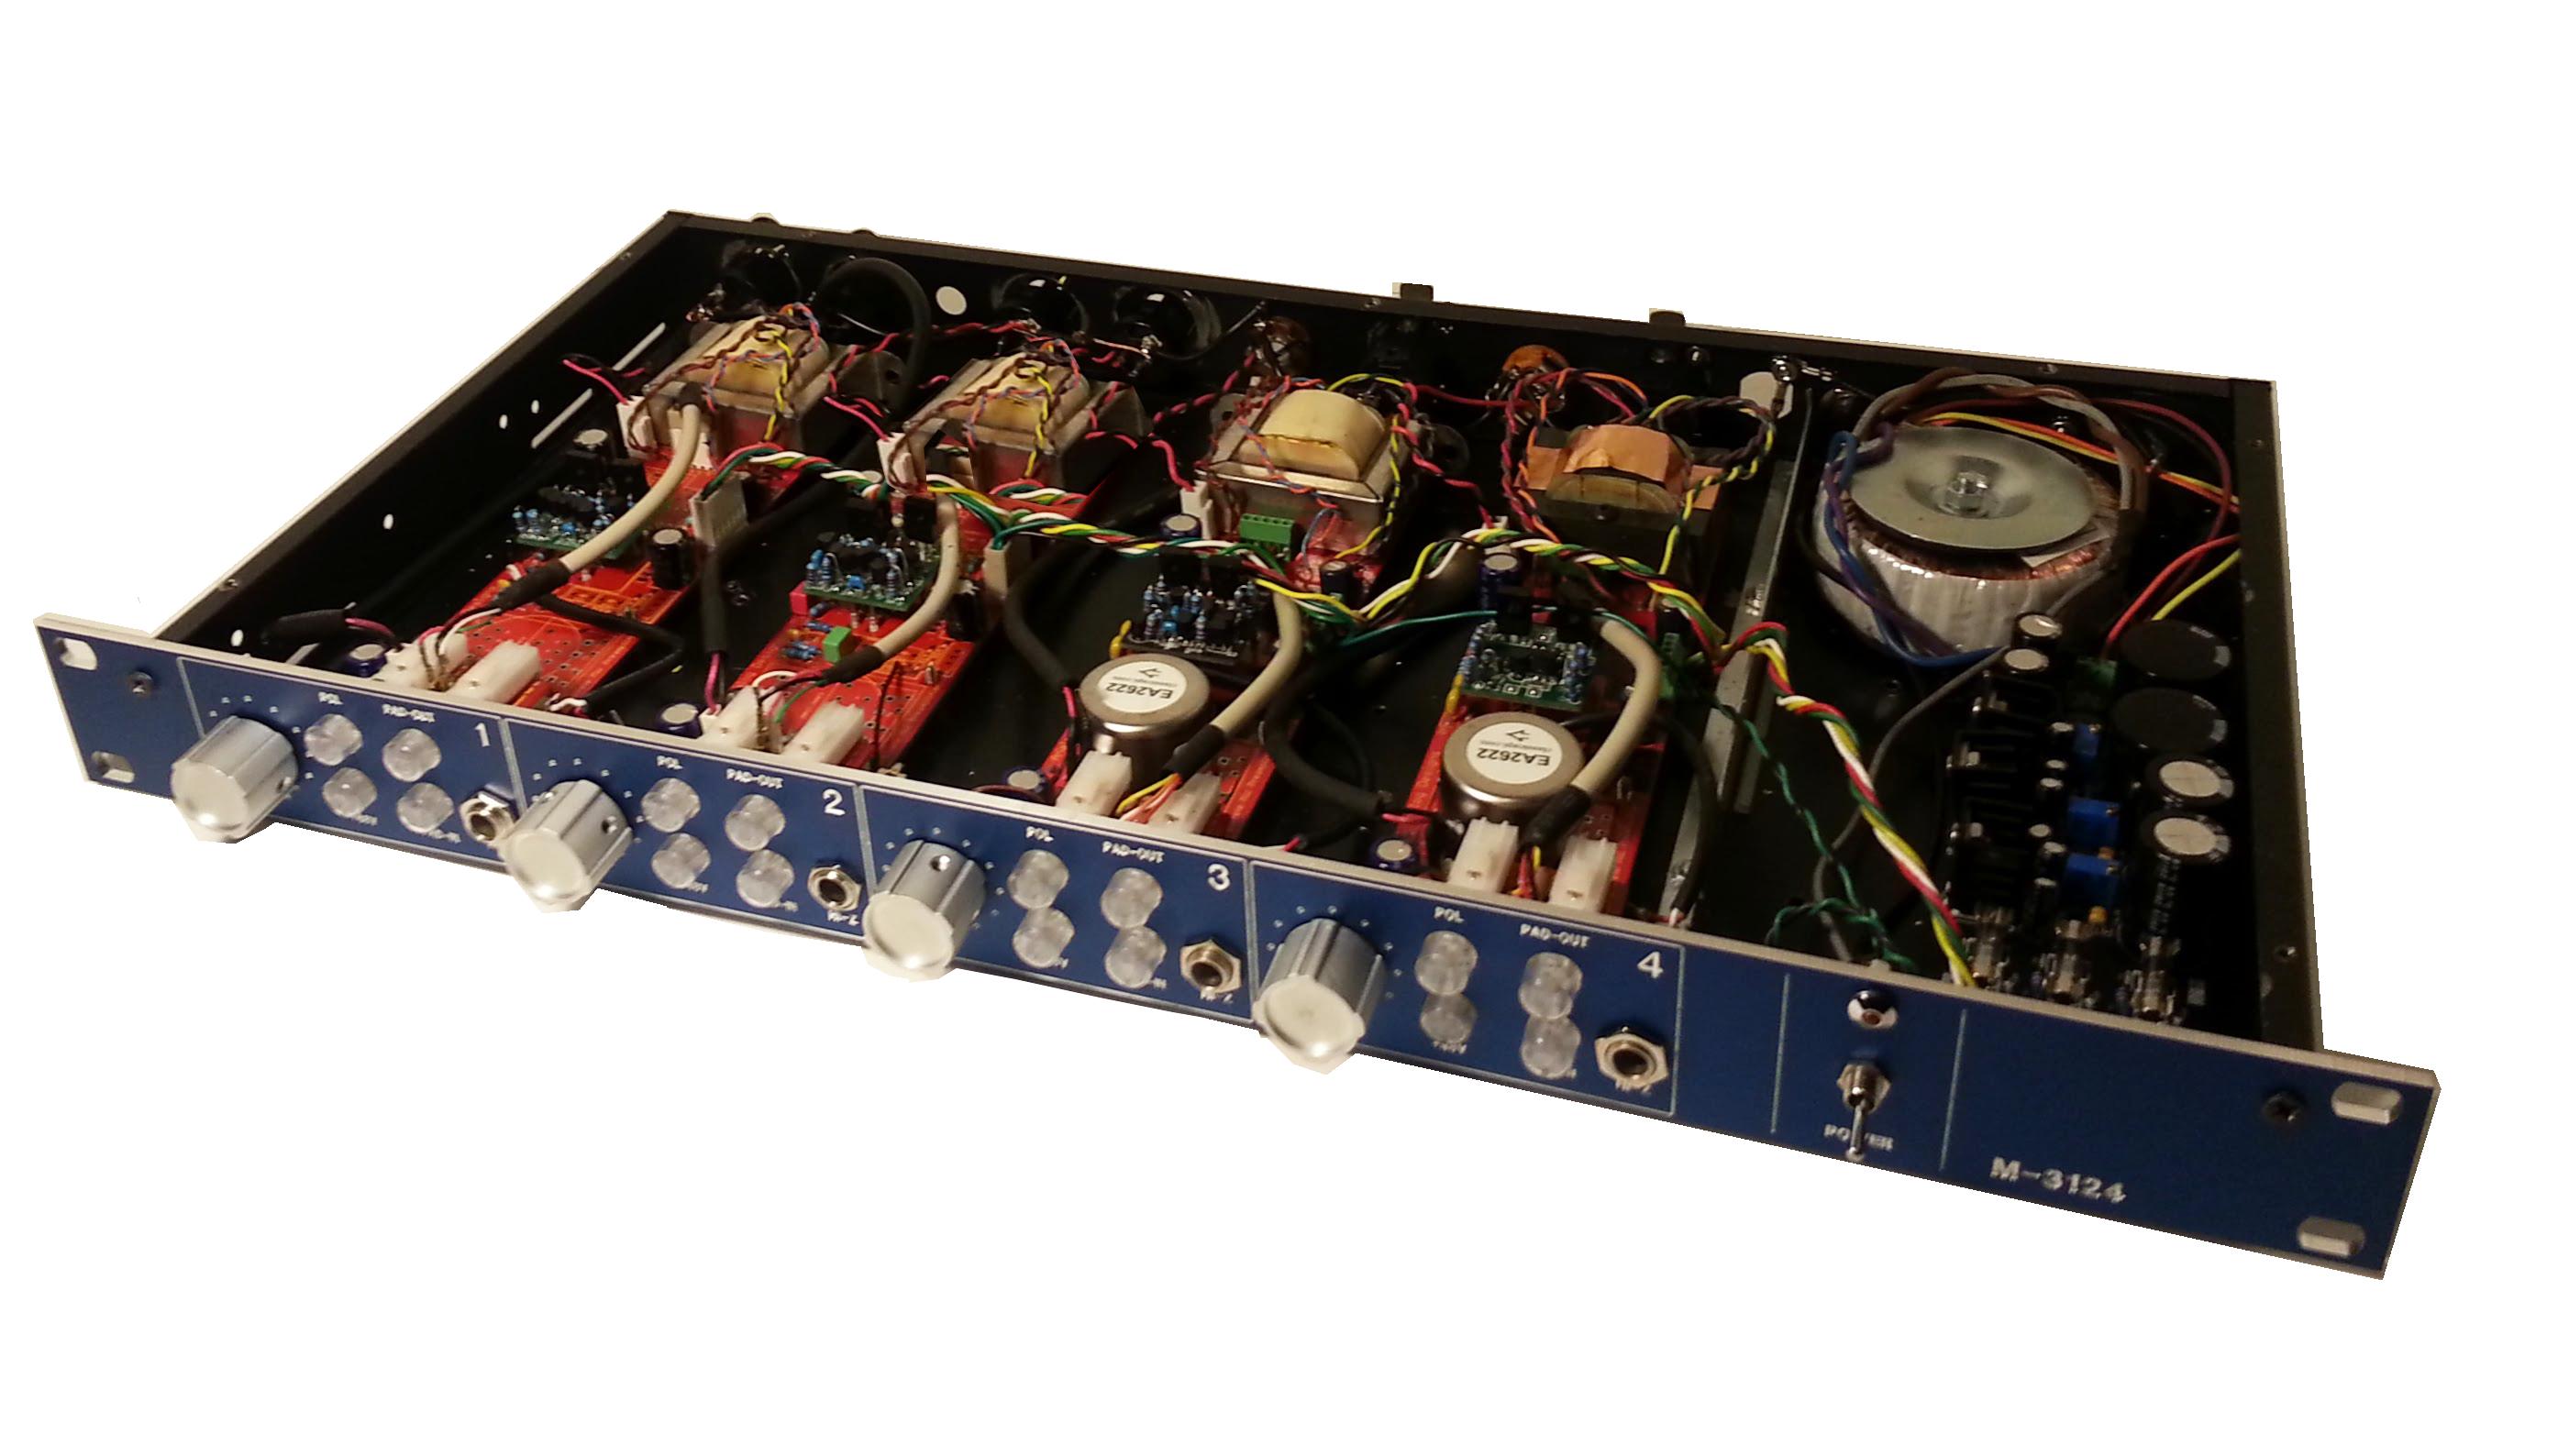 M-3124